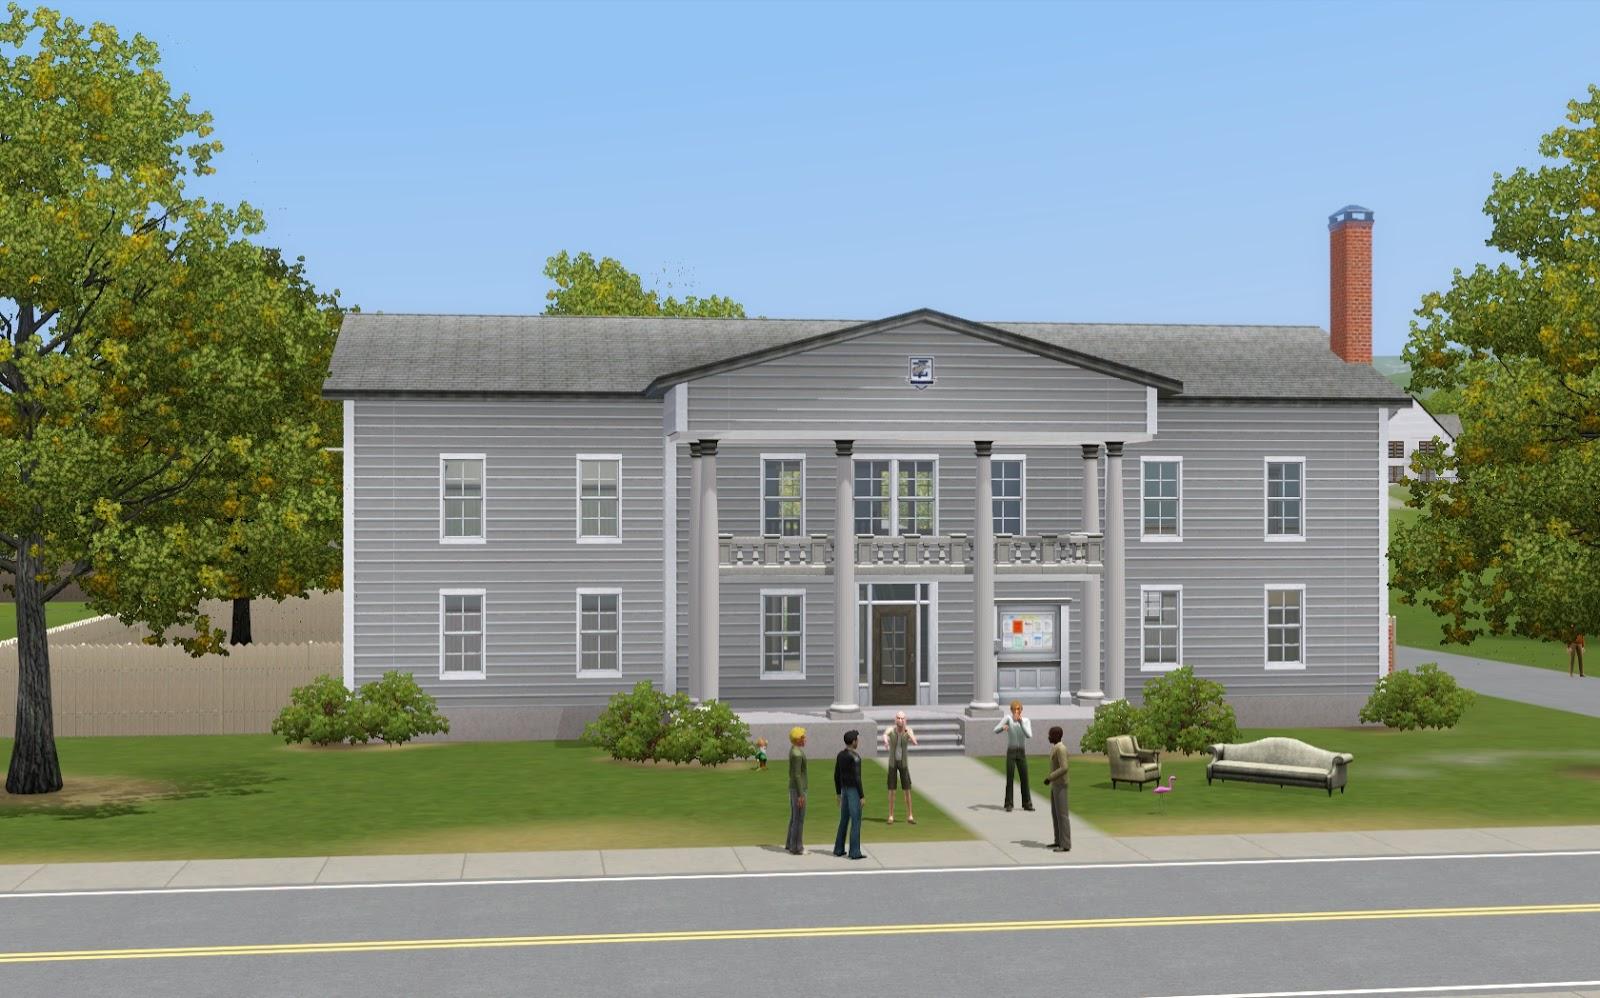 Summer's Little Sims 3 Garden: Sims University (The Sims 3